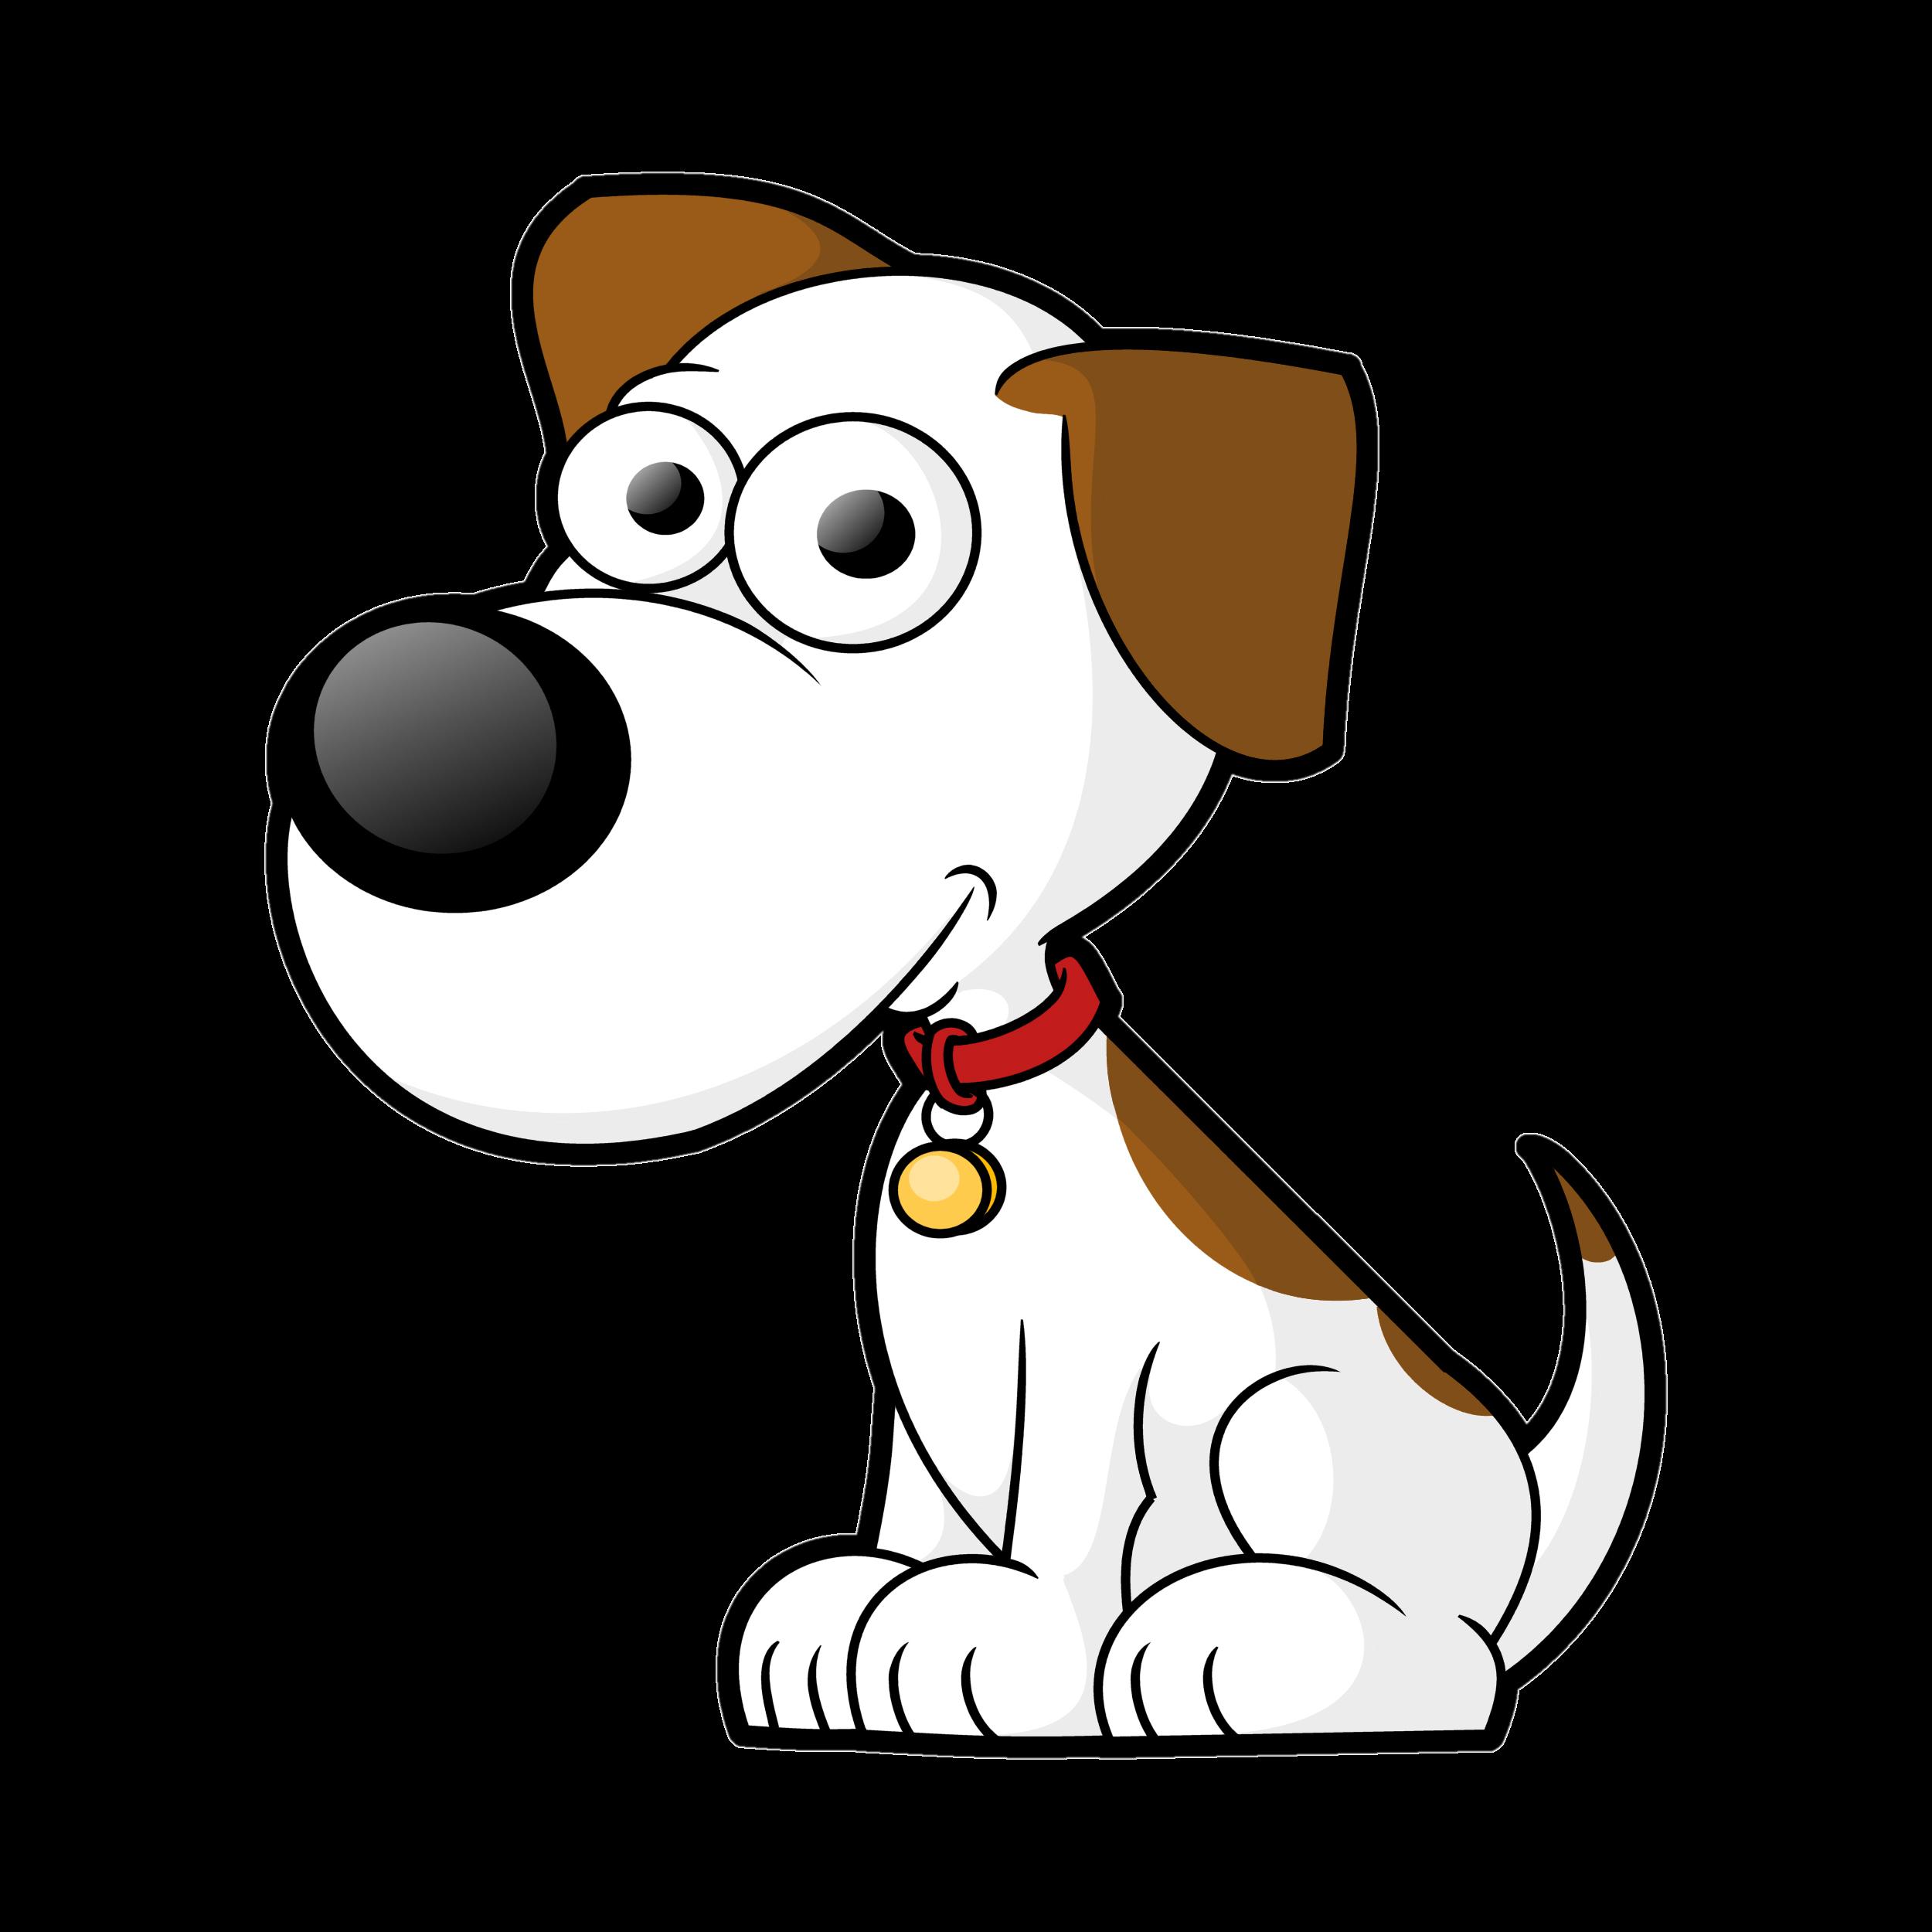 Dog vector png, Dog vector png Transparent FREE for download